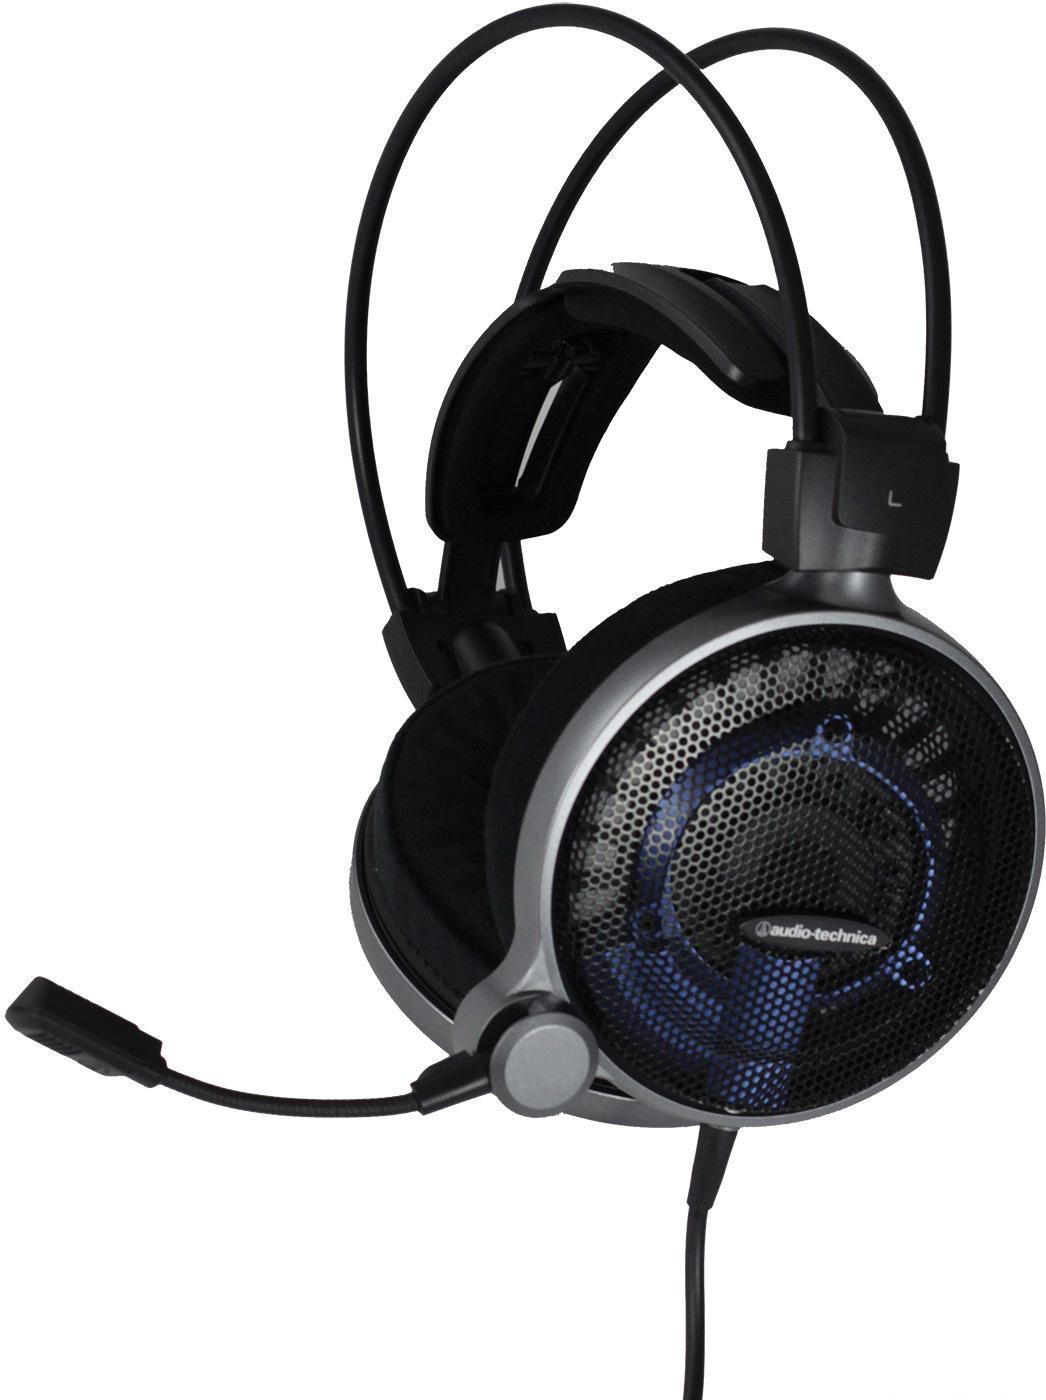 Audio-Technica ATH-ADG1X - игровая Hi-Fi гарнитура (Black)